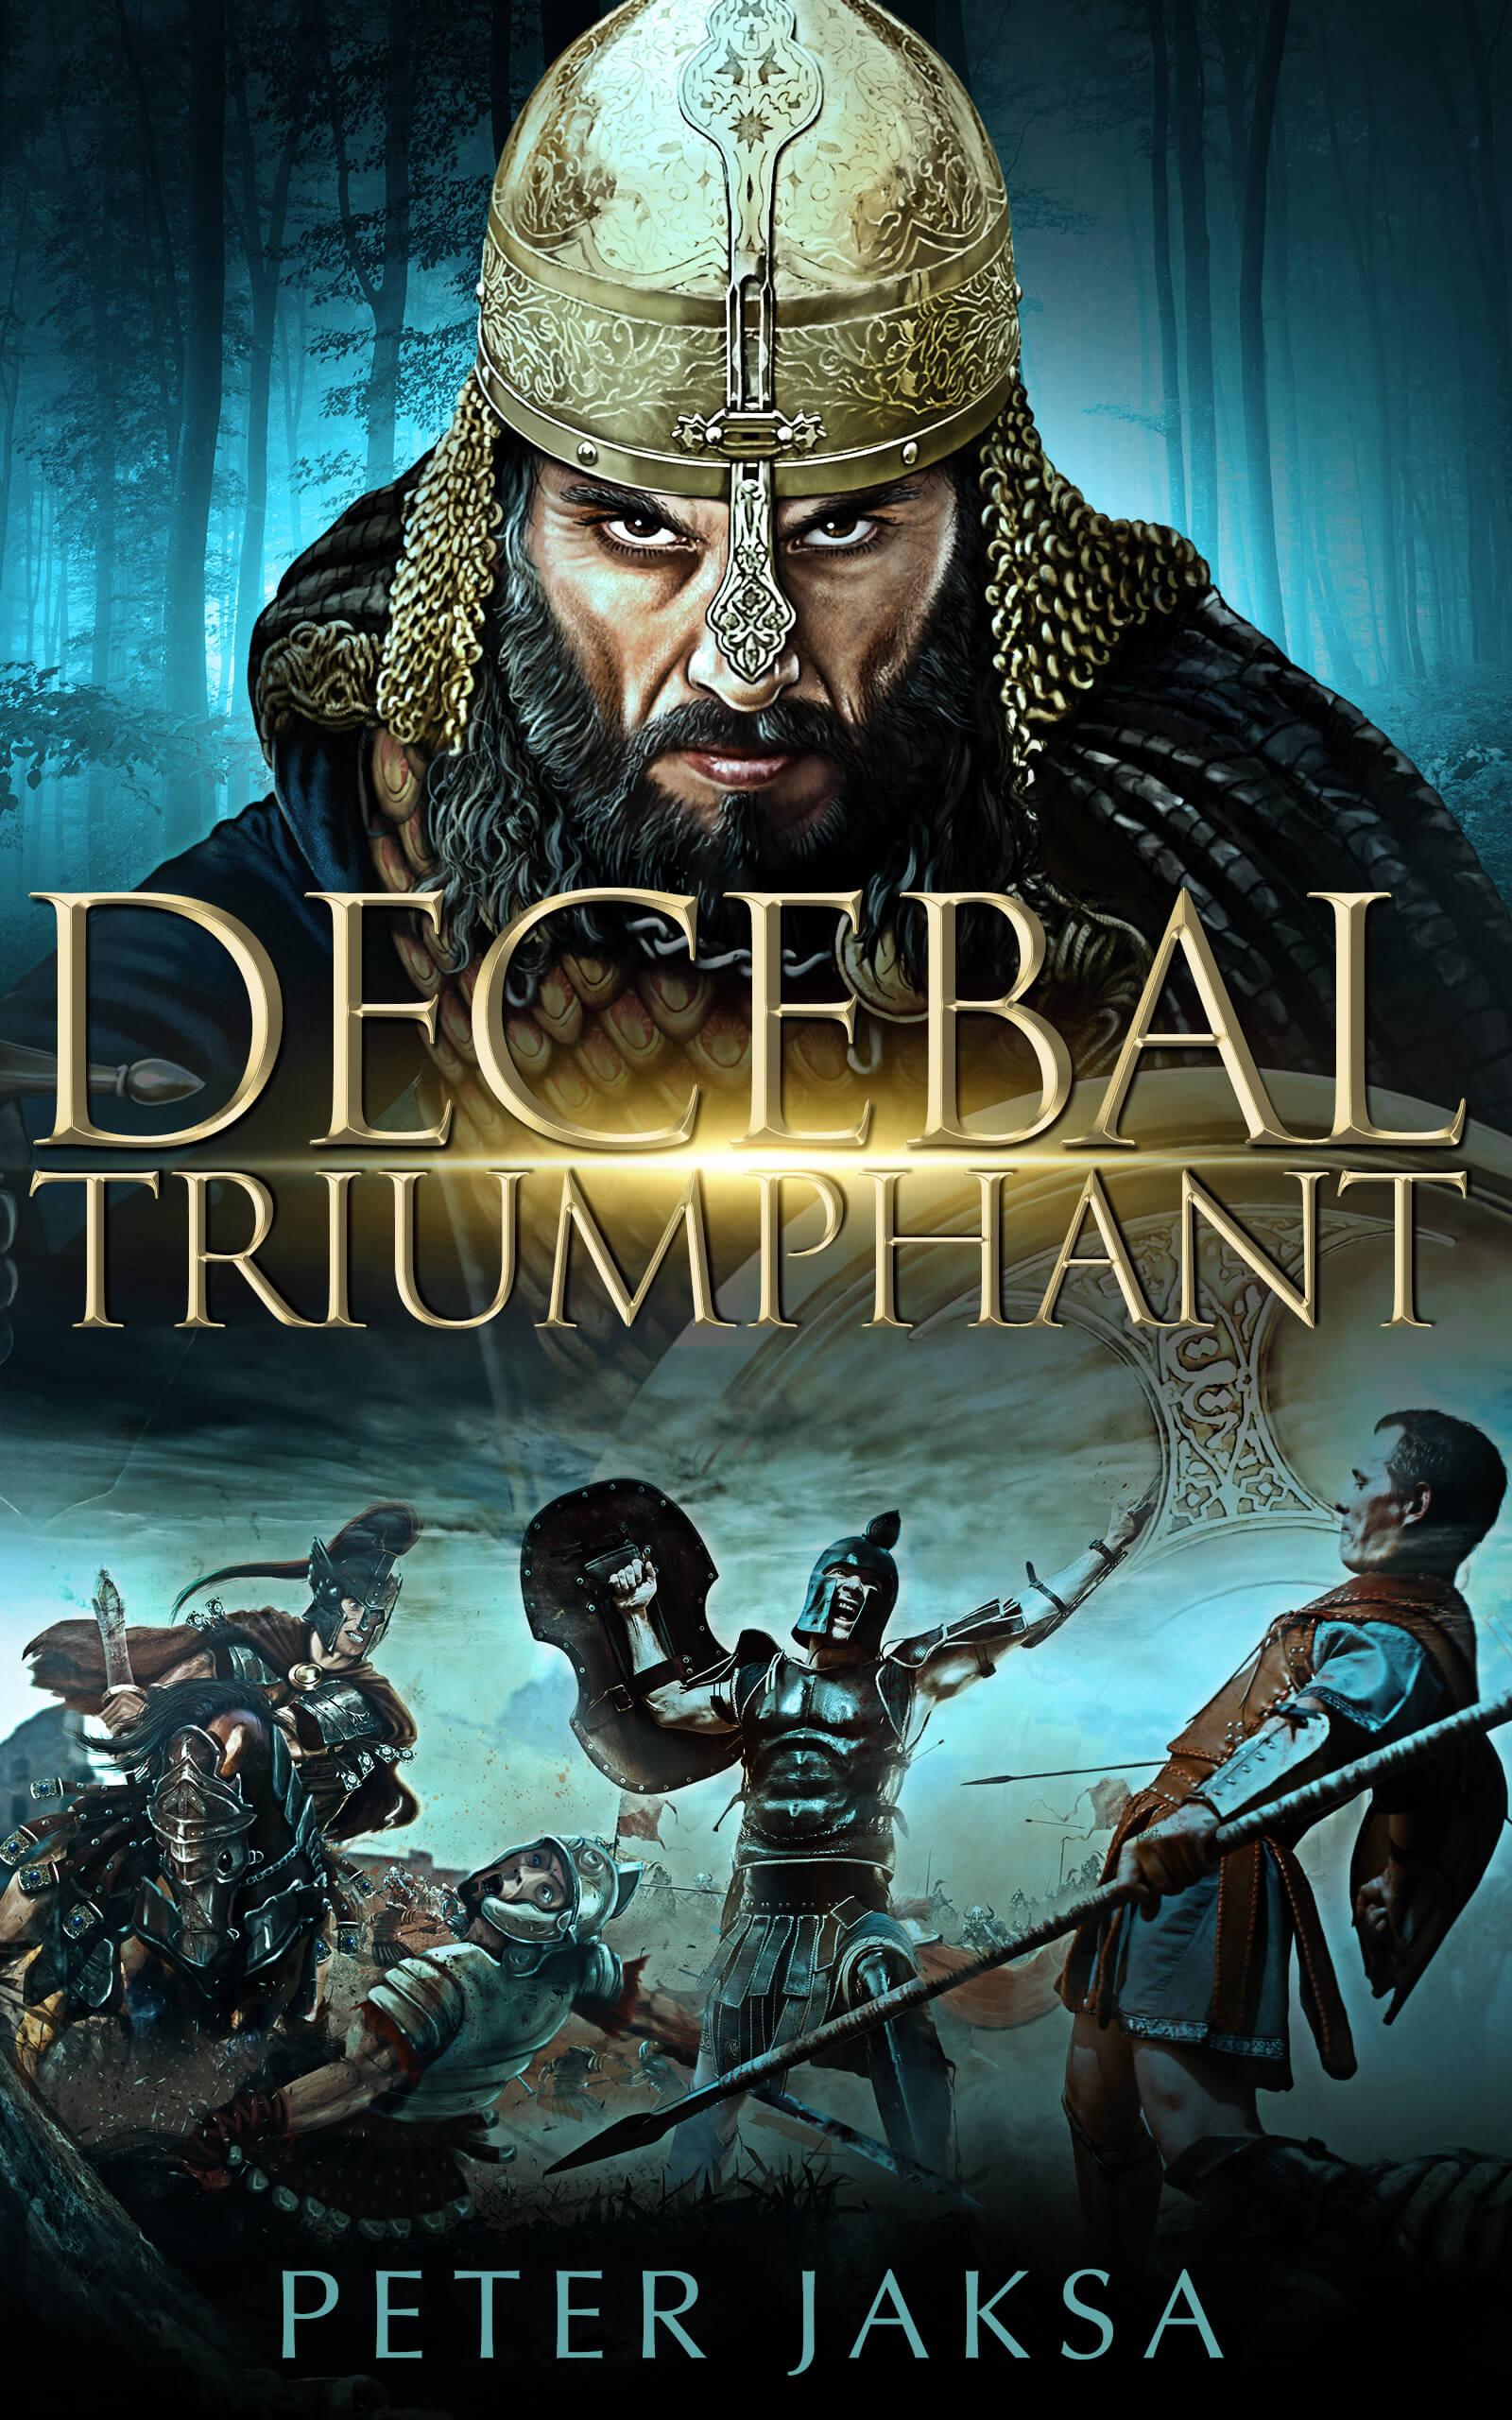 Decebal TriumphantSMALL